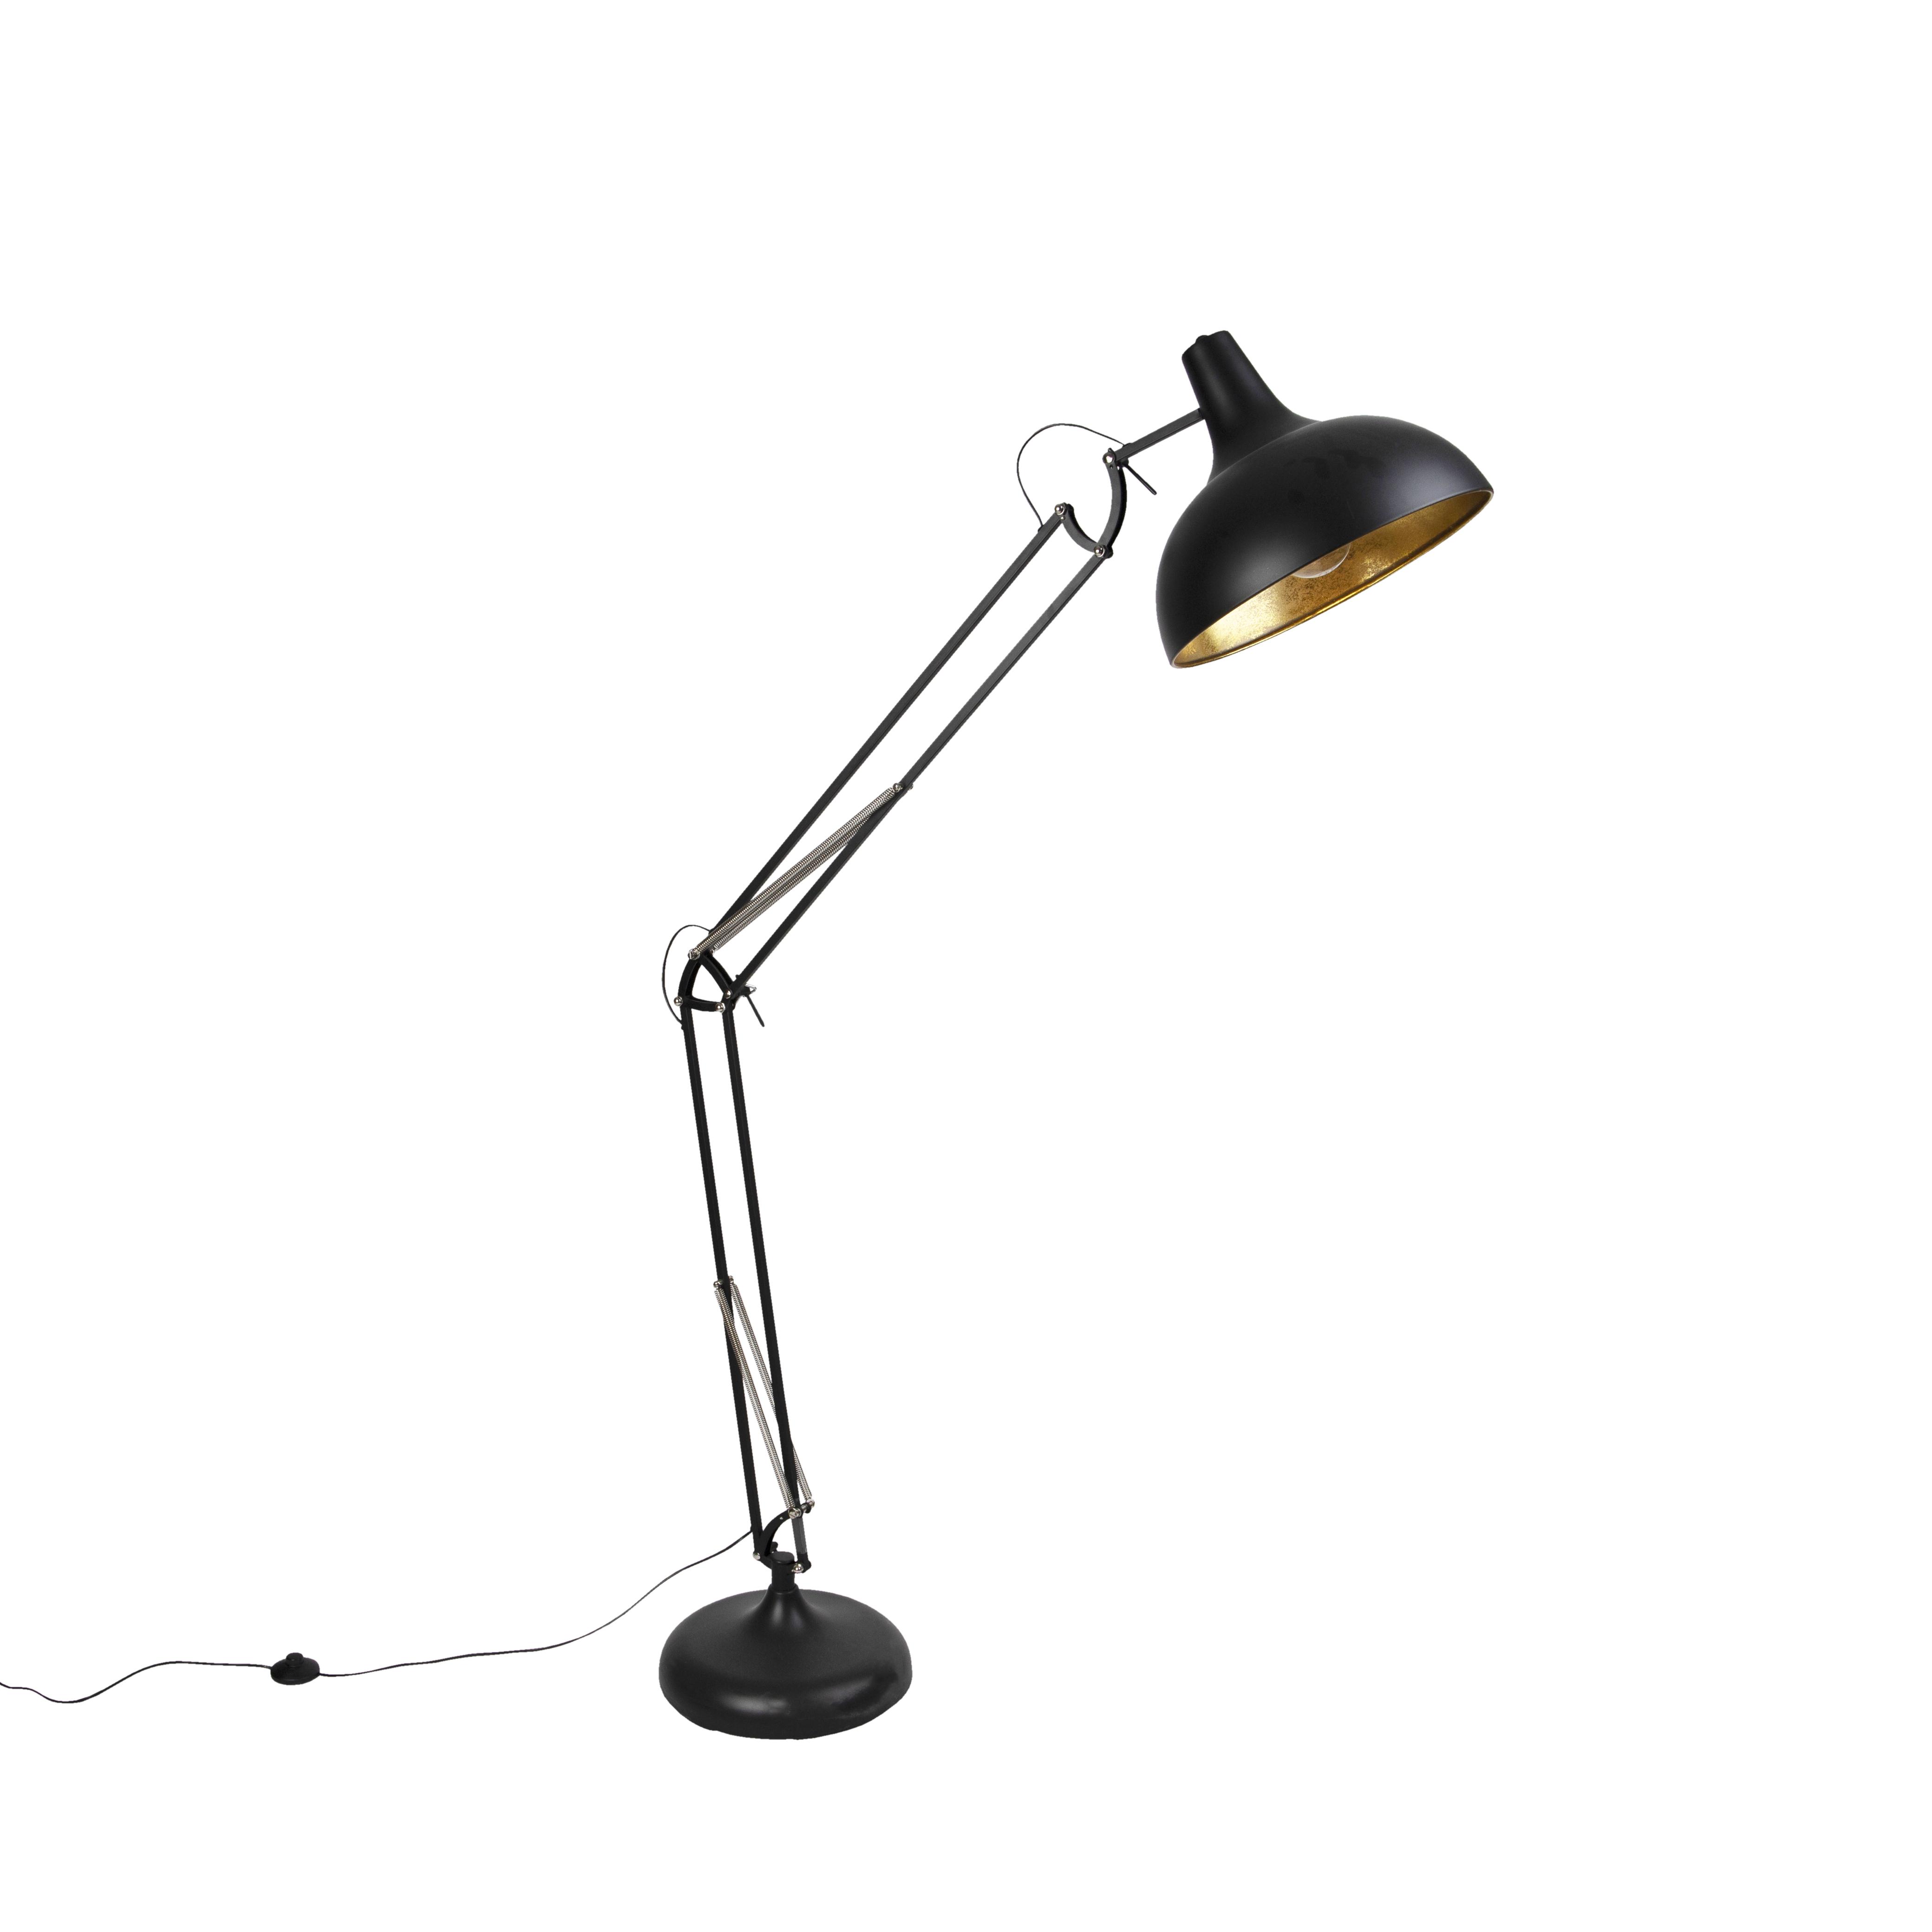 Stoere vloerlamp zwart met gouden binnenkant - Hobby